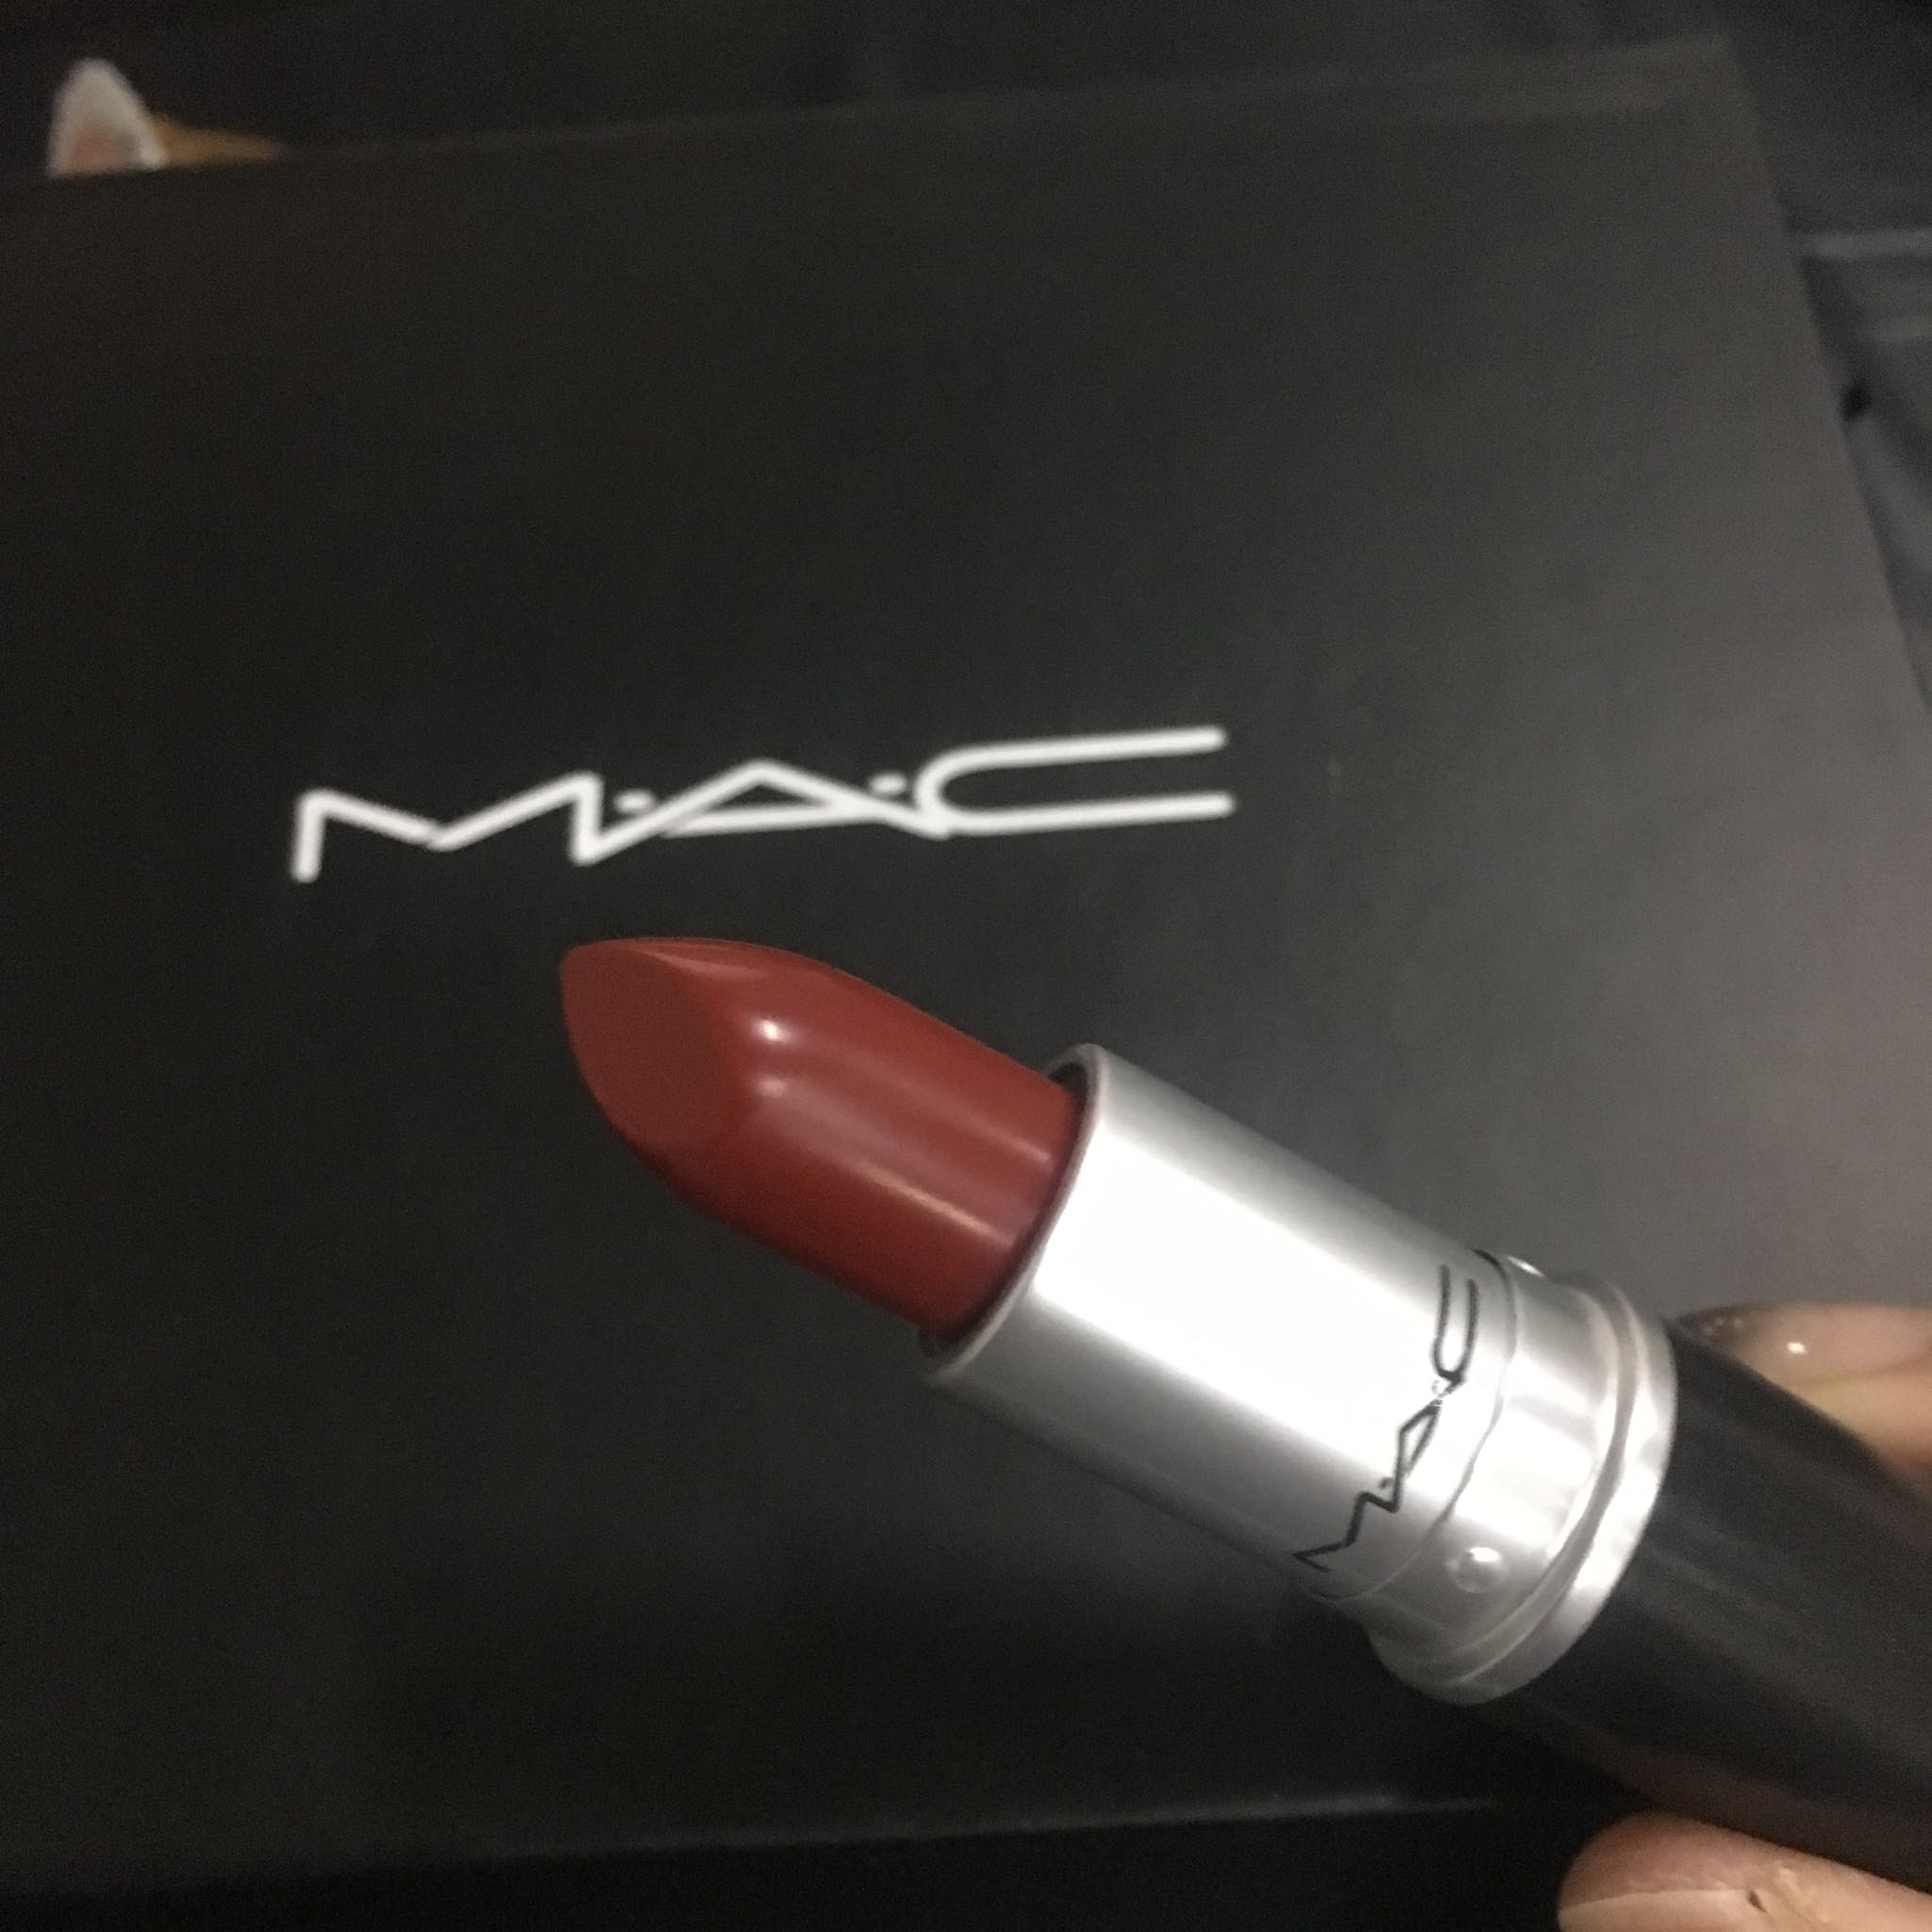 mac口红ruby woo和Russian red对比——雾面显白少女